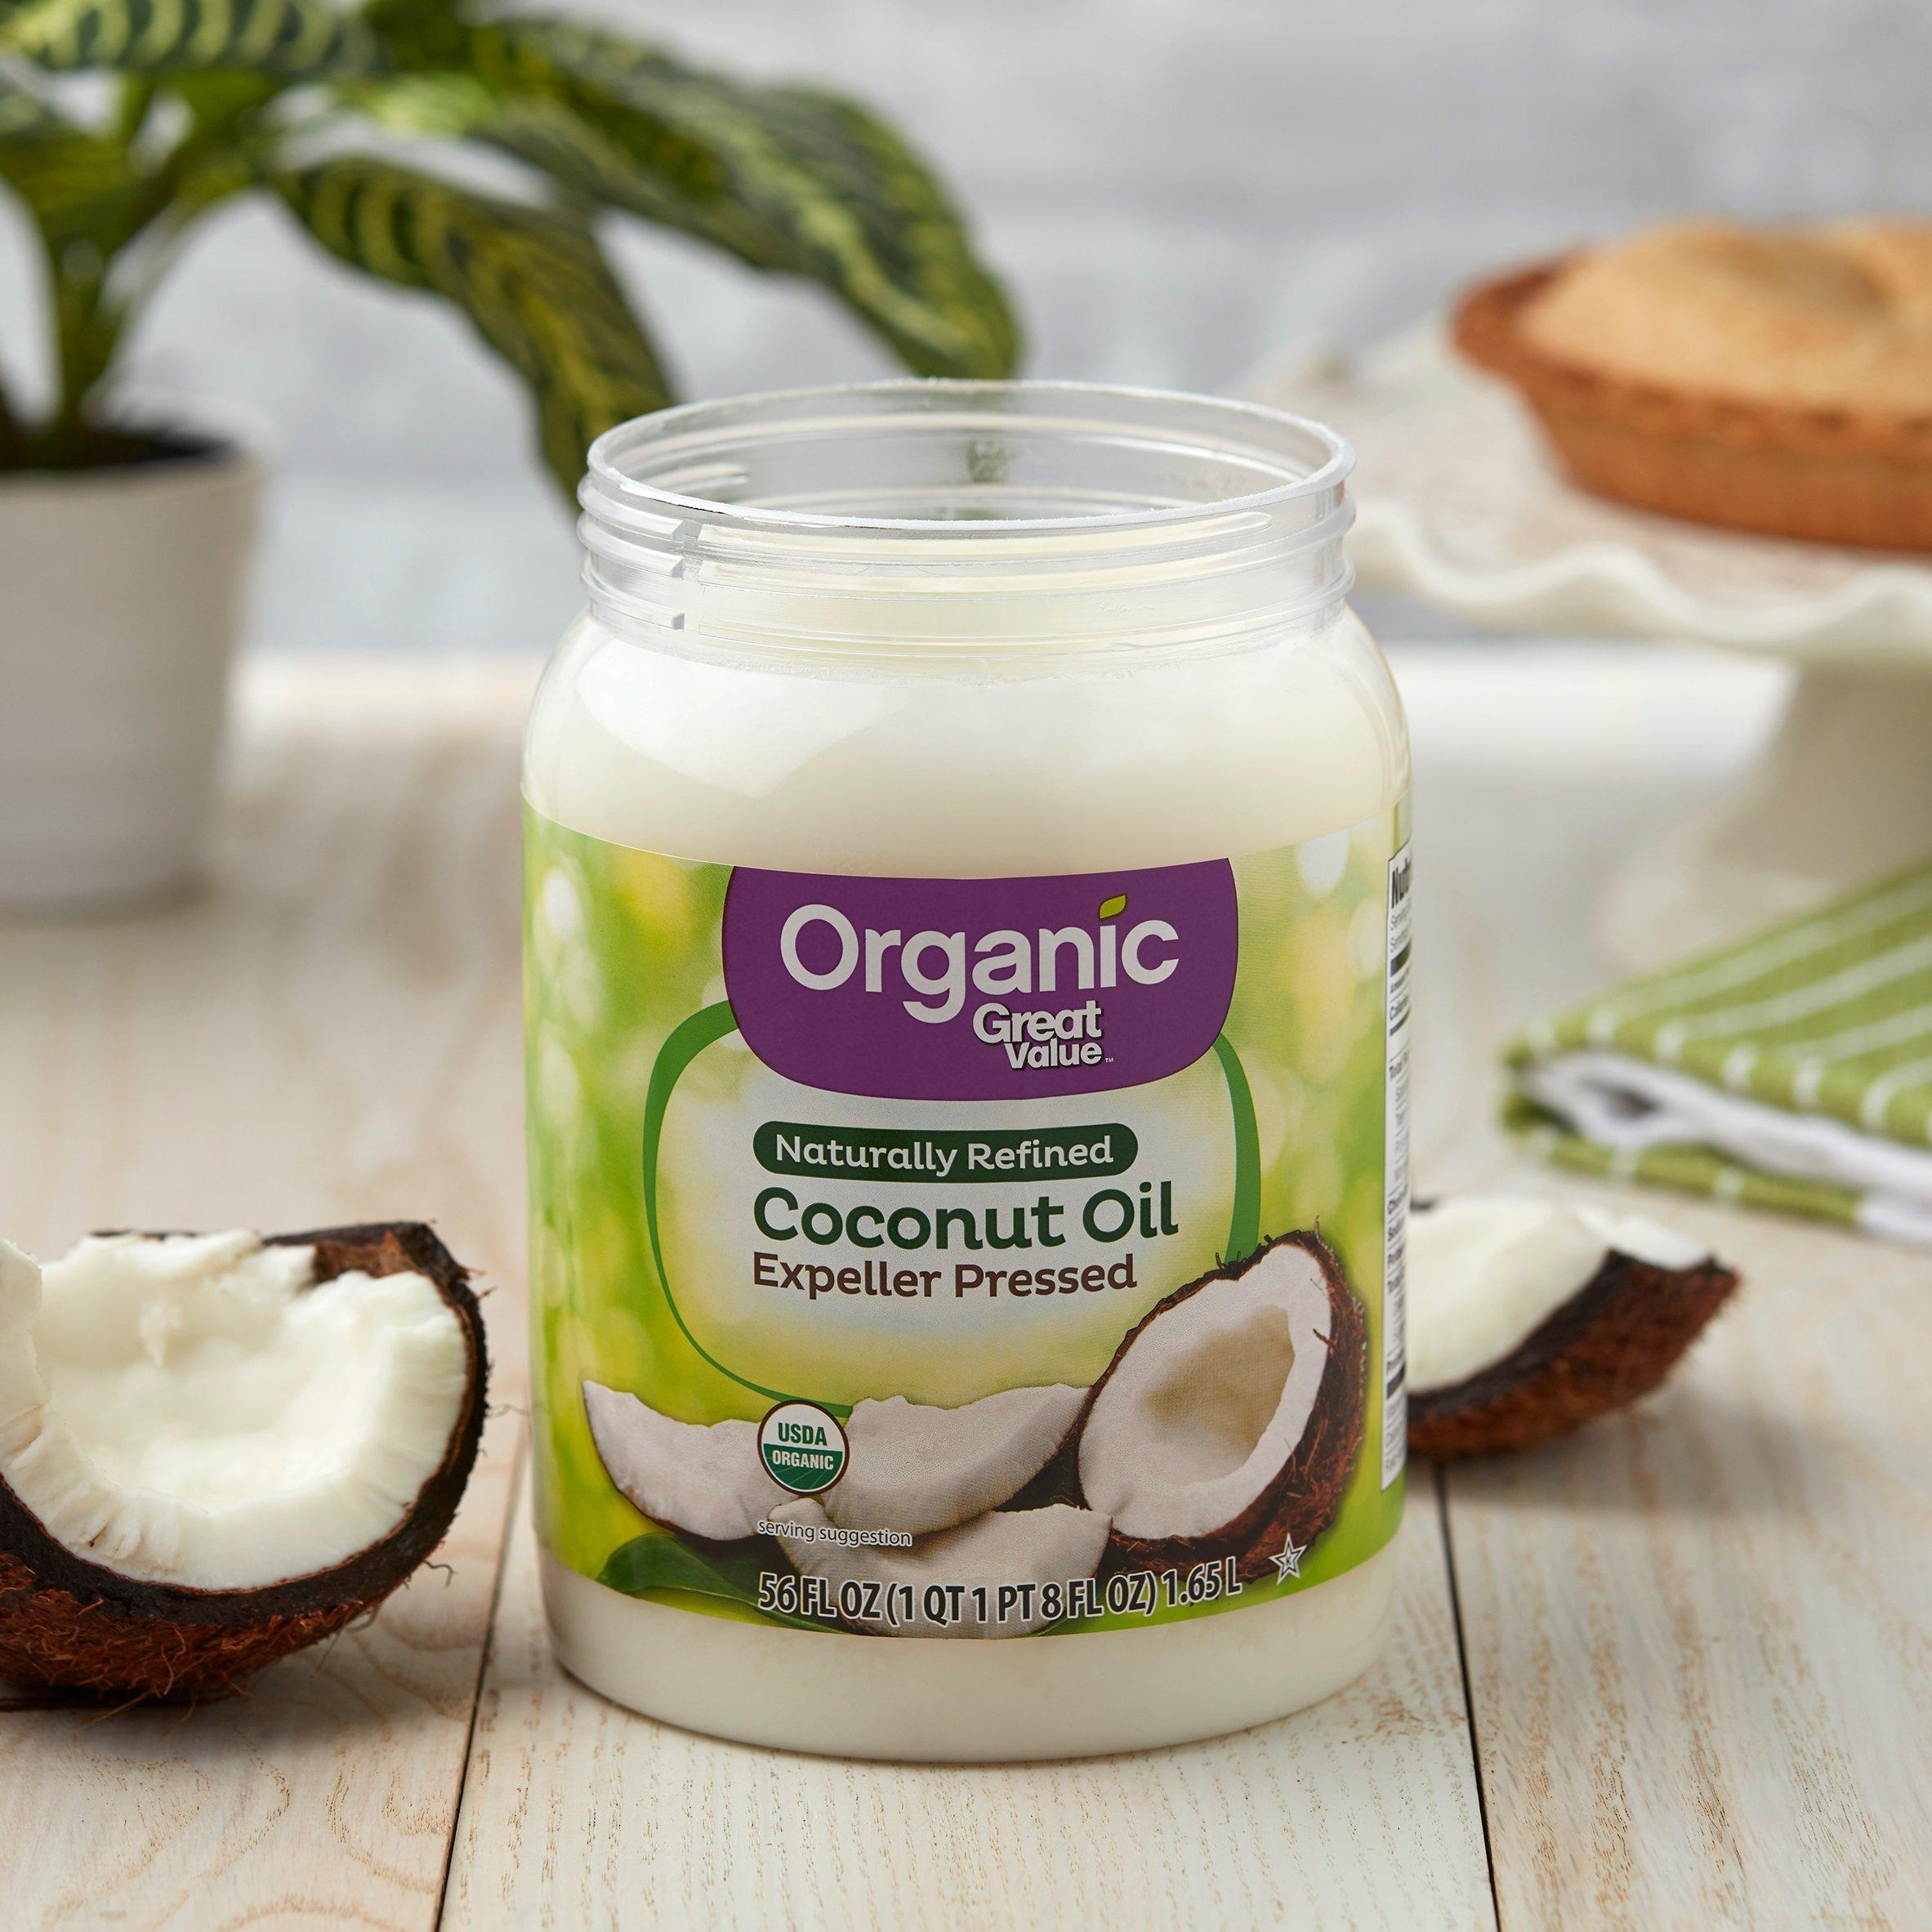 Geraffineerde kokosolie